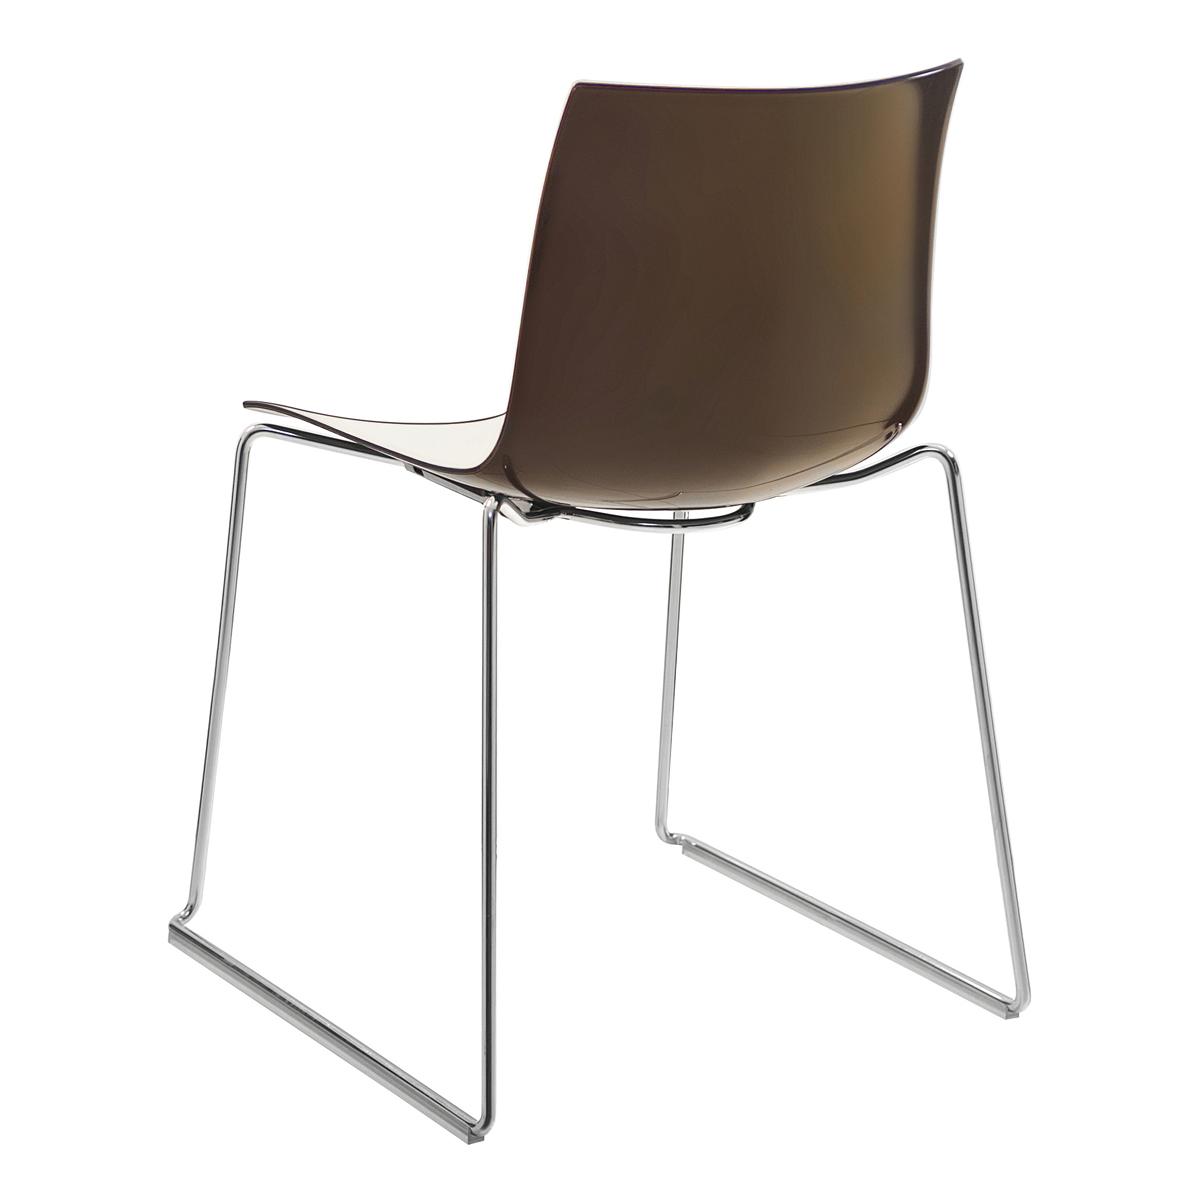 Stuhl Catifa 46, 4-Fuß, weiß-braun